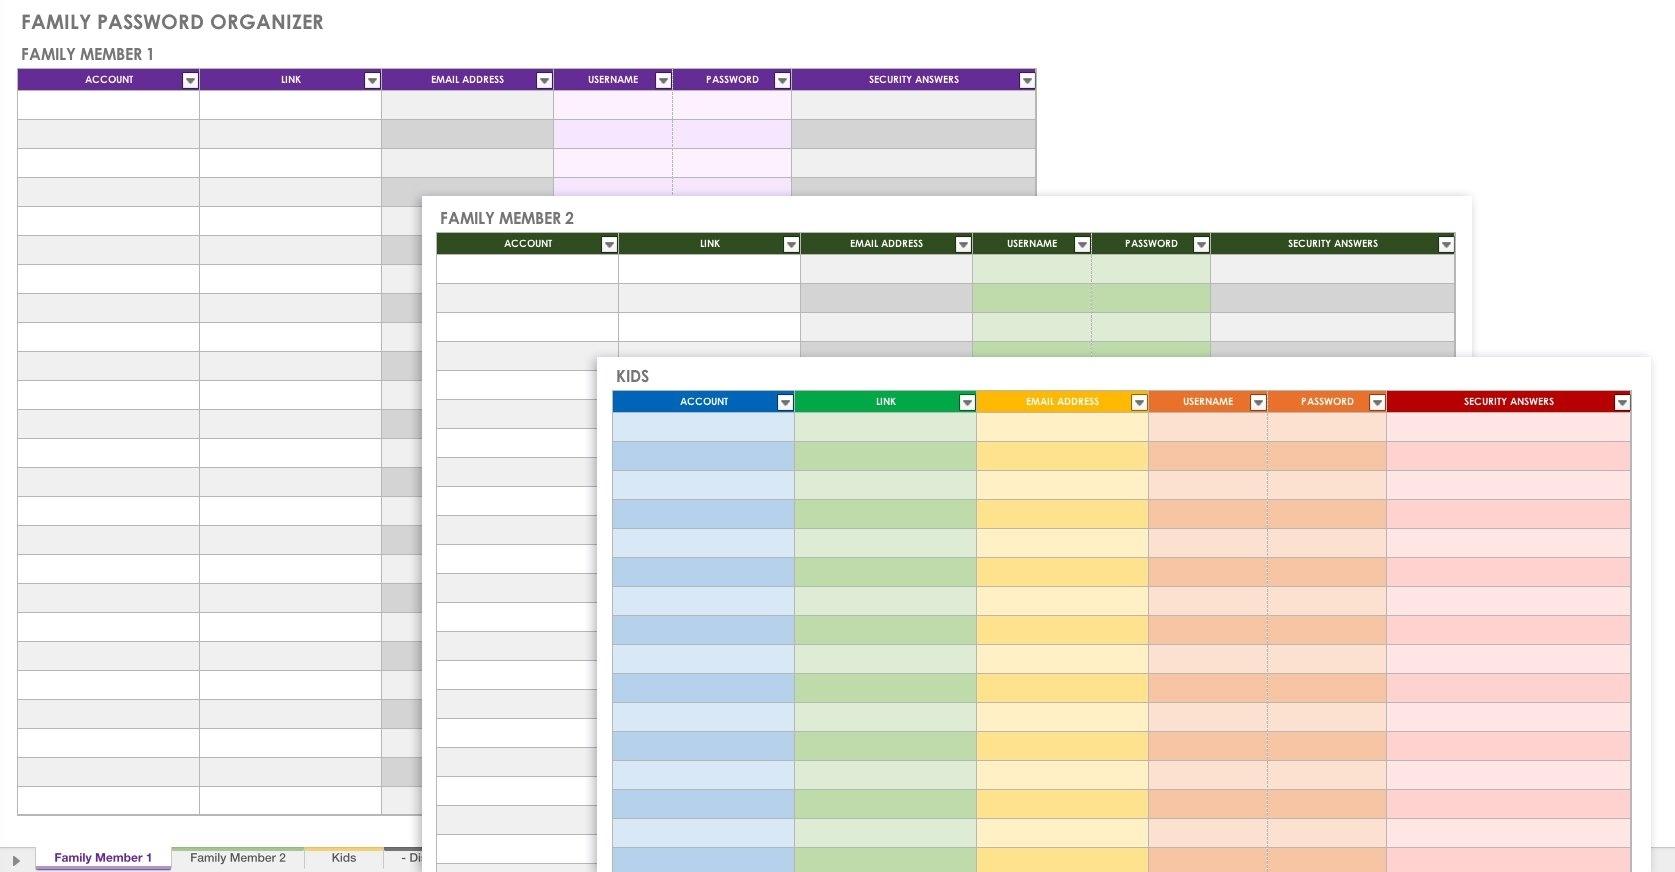 Free Password Templates And Spreadsheets   Smartsheet with regard to Free Printable Password Organizer Sheets